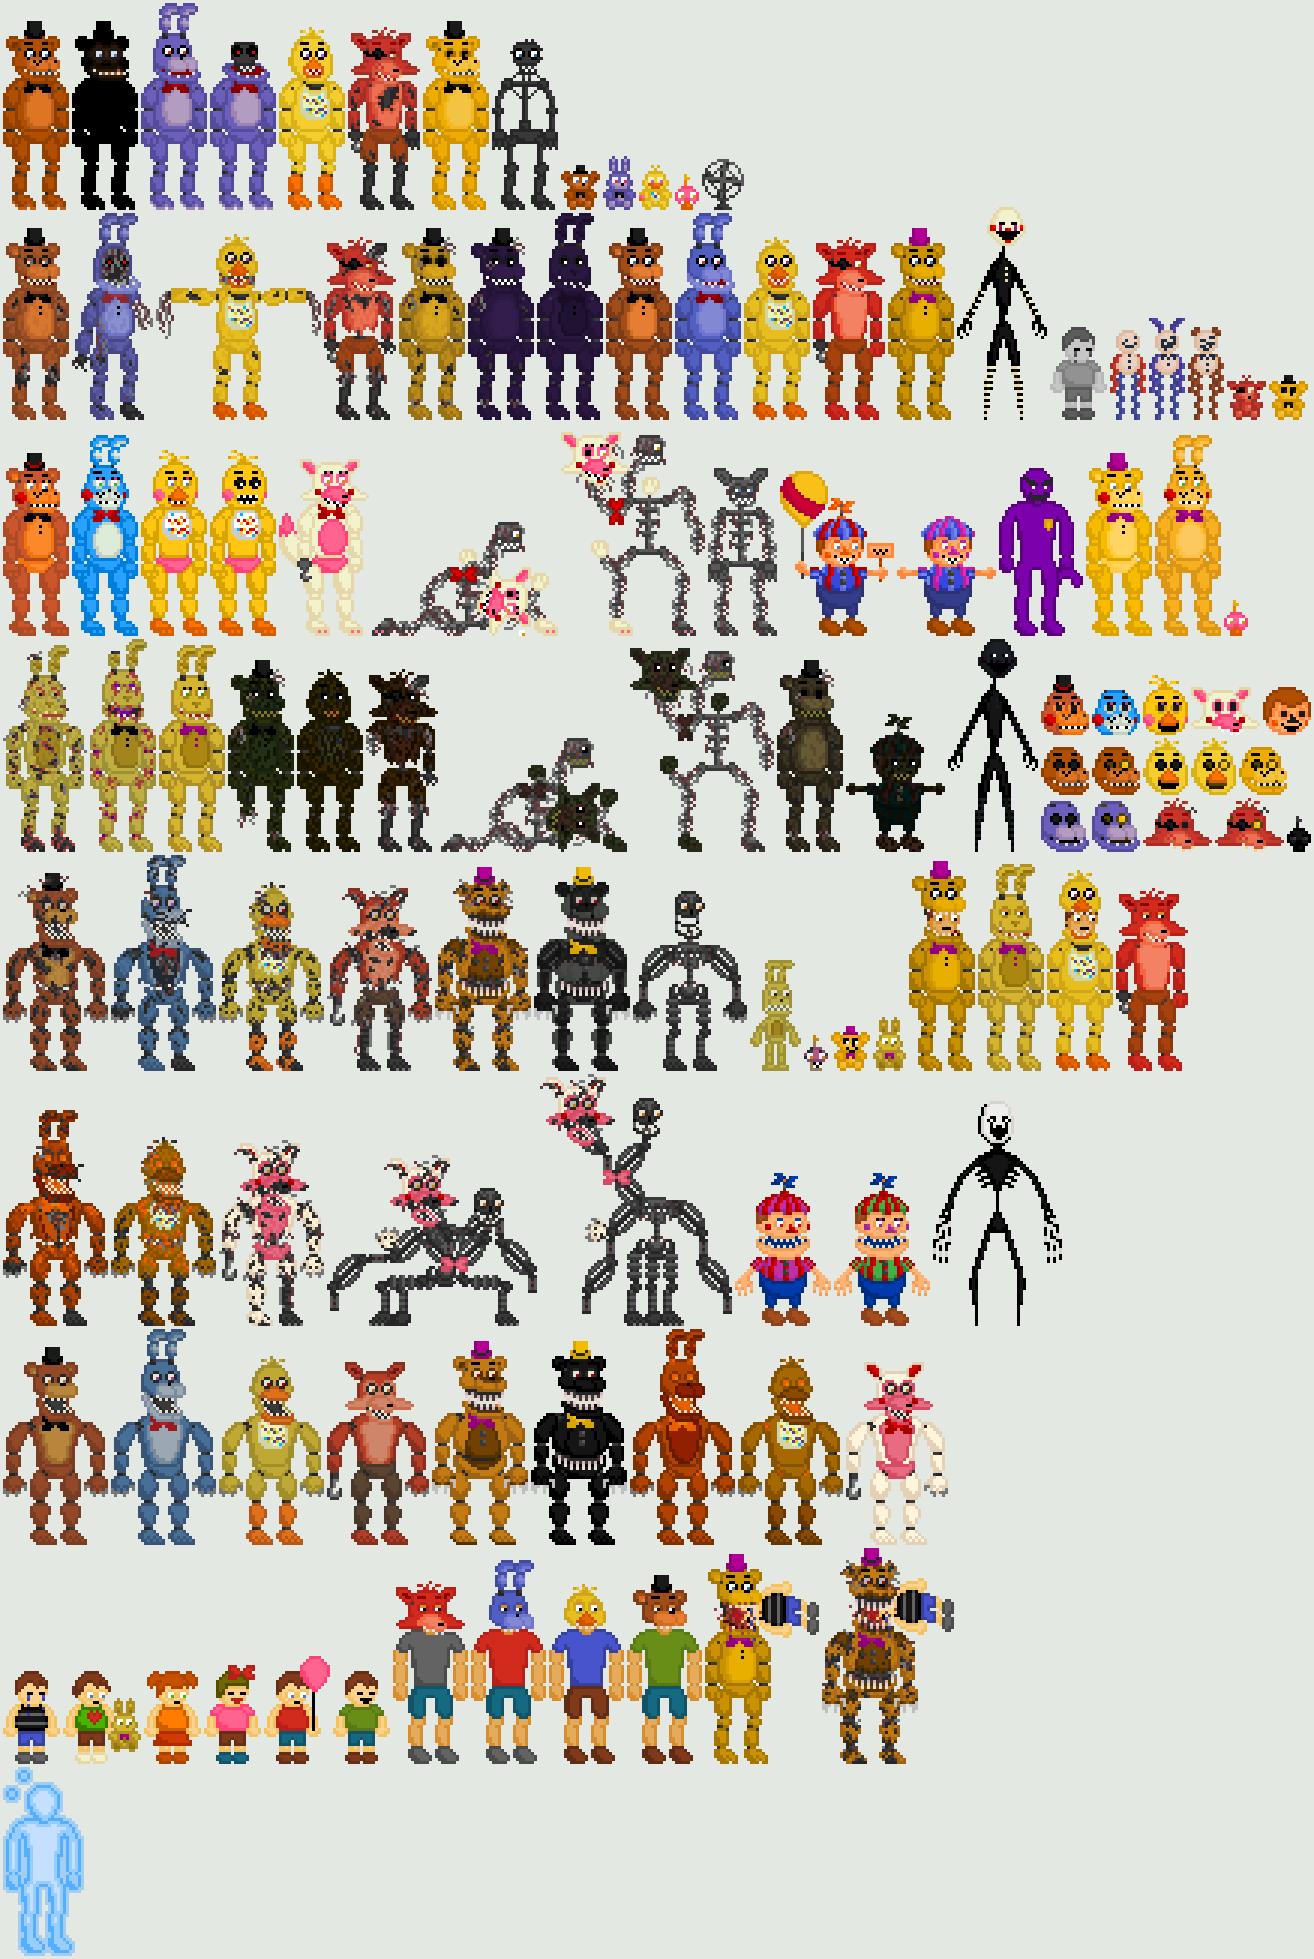 Five Nights at Freddy's Pixel Art by Shaddow24 on DeviantArt